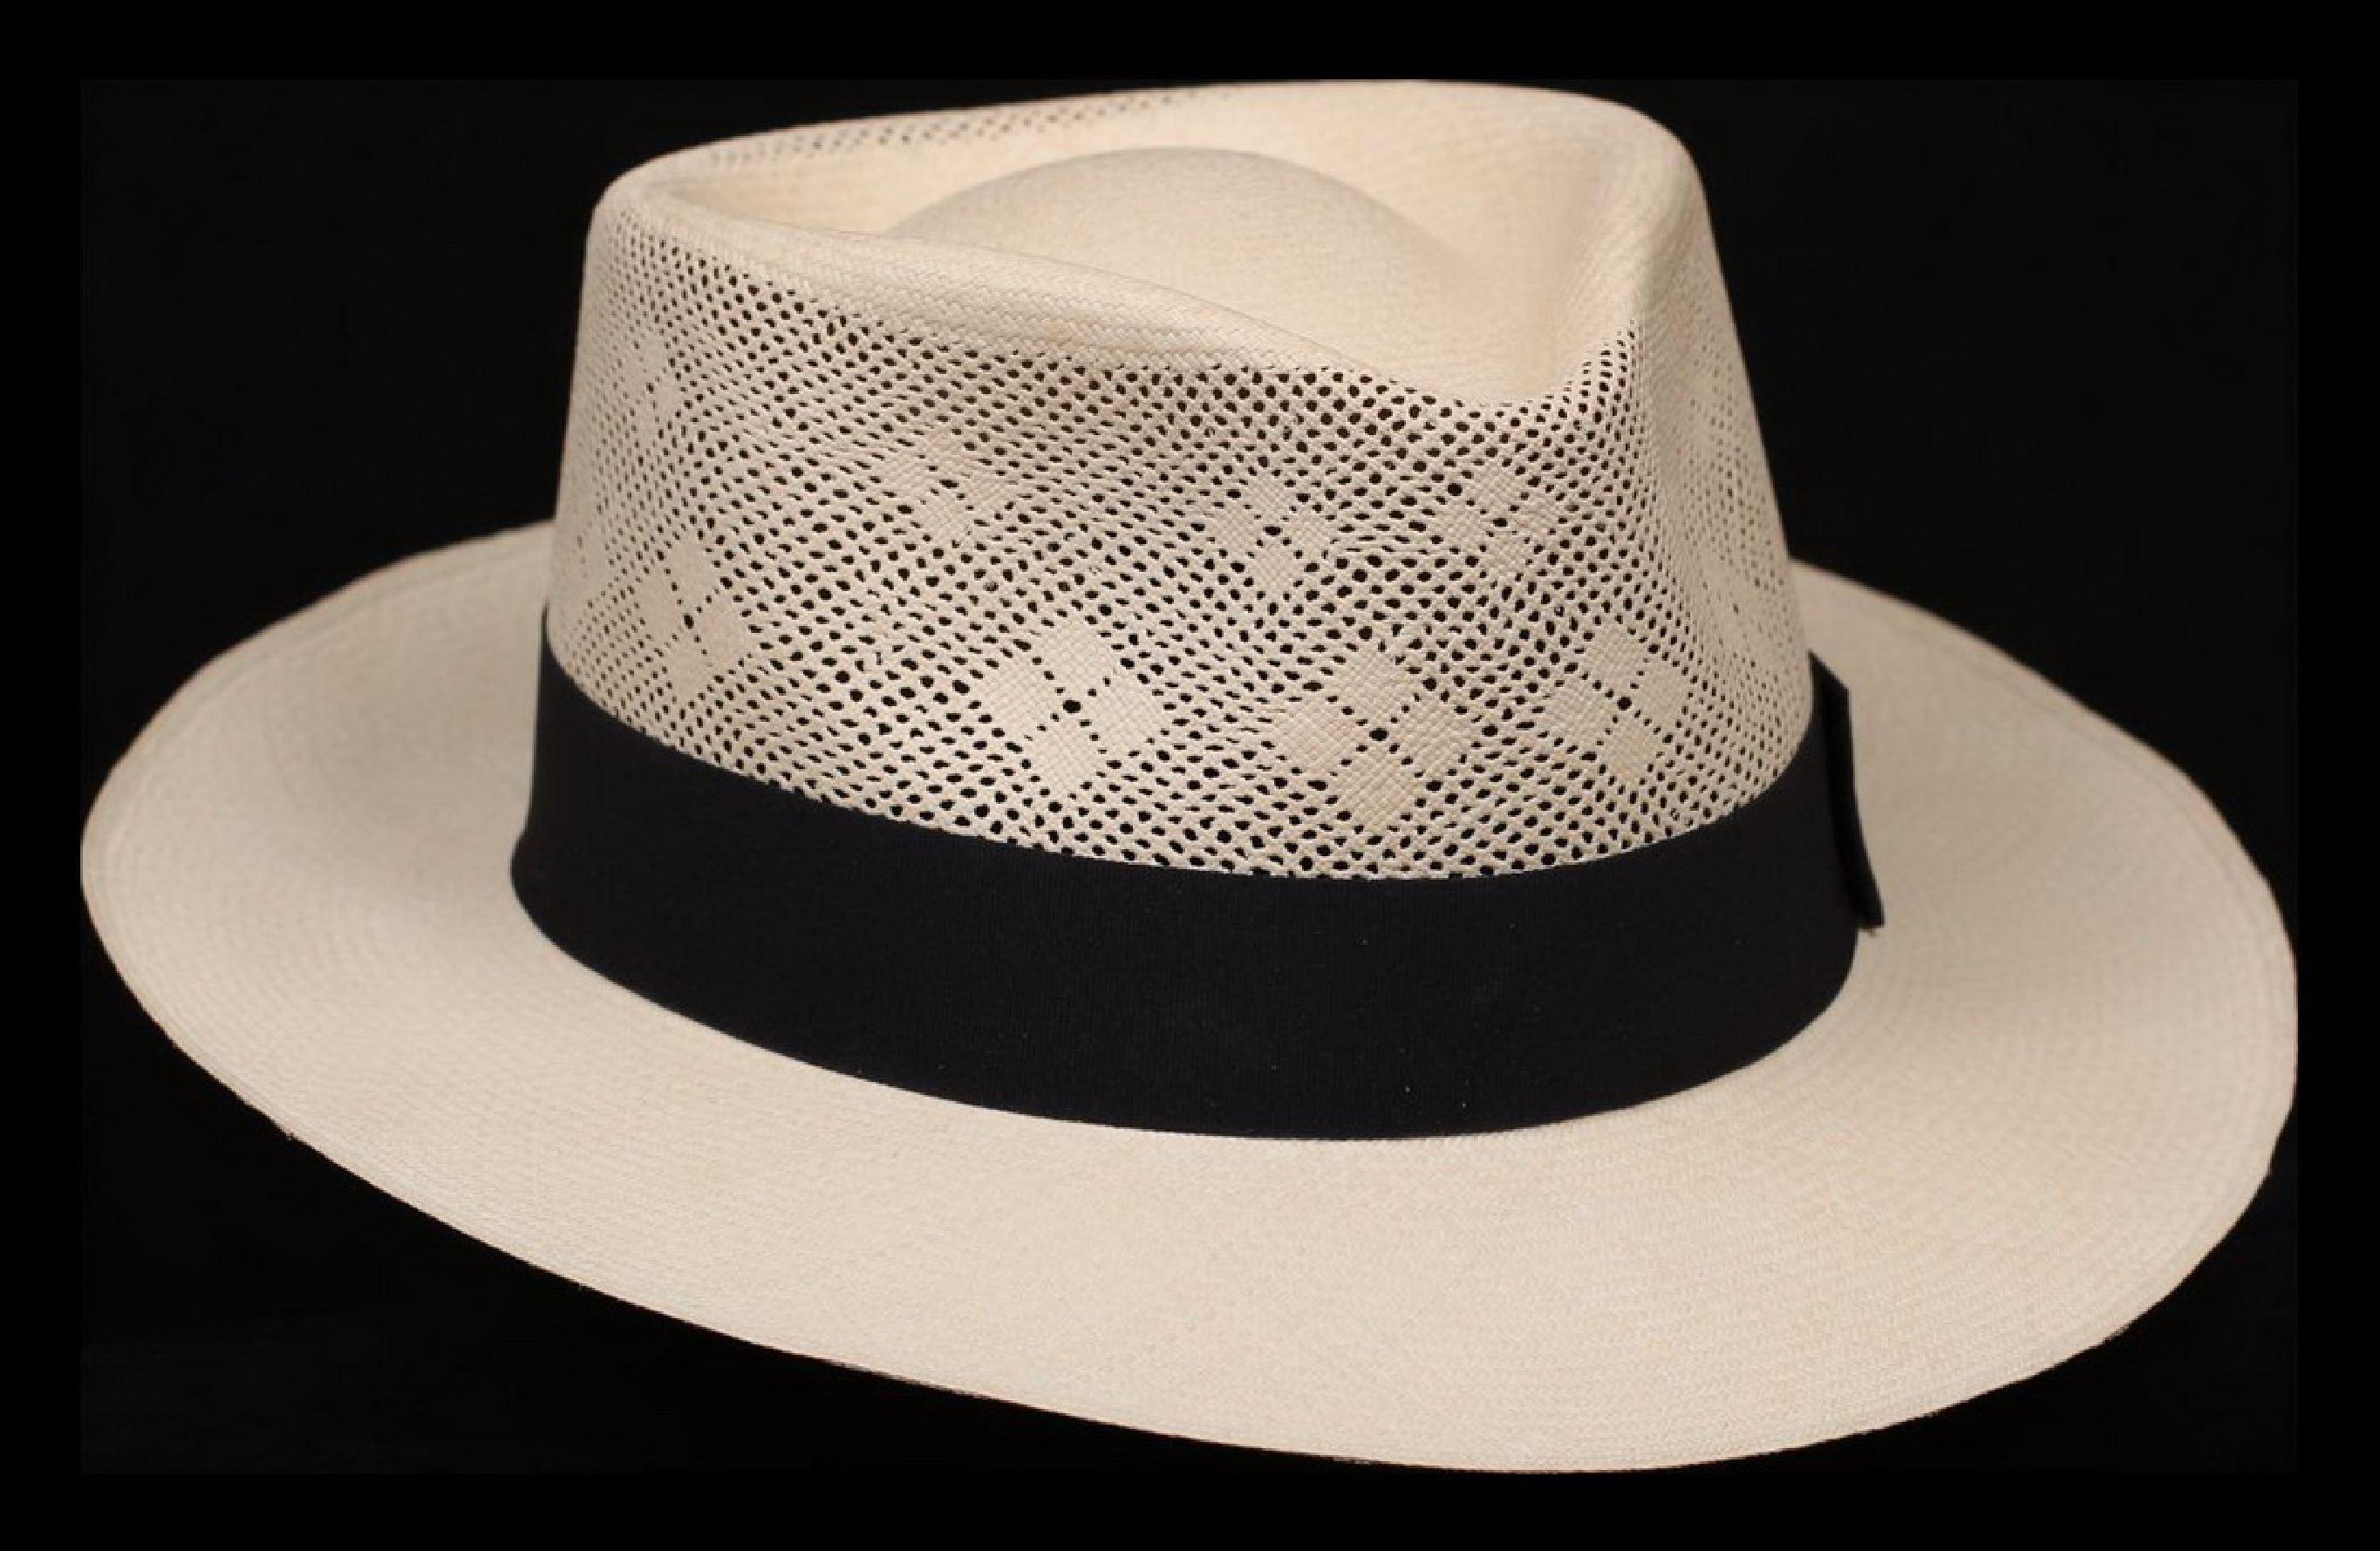 Montecristi Fino Fino, Havana, $325, Panama Hats Direct, before sweatband installation (2).JPG